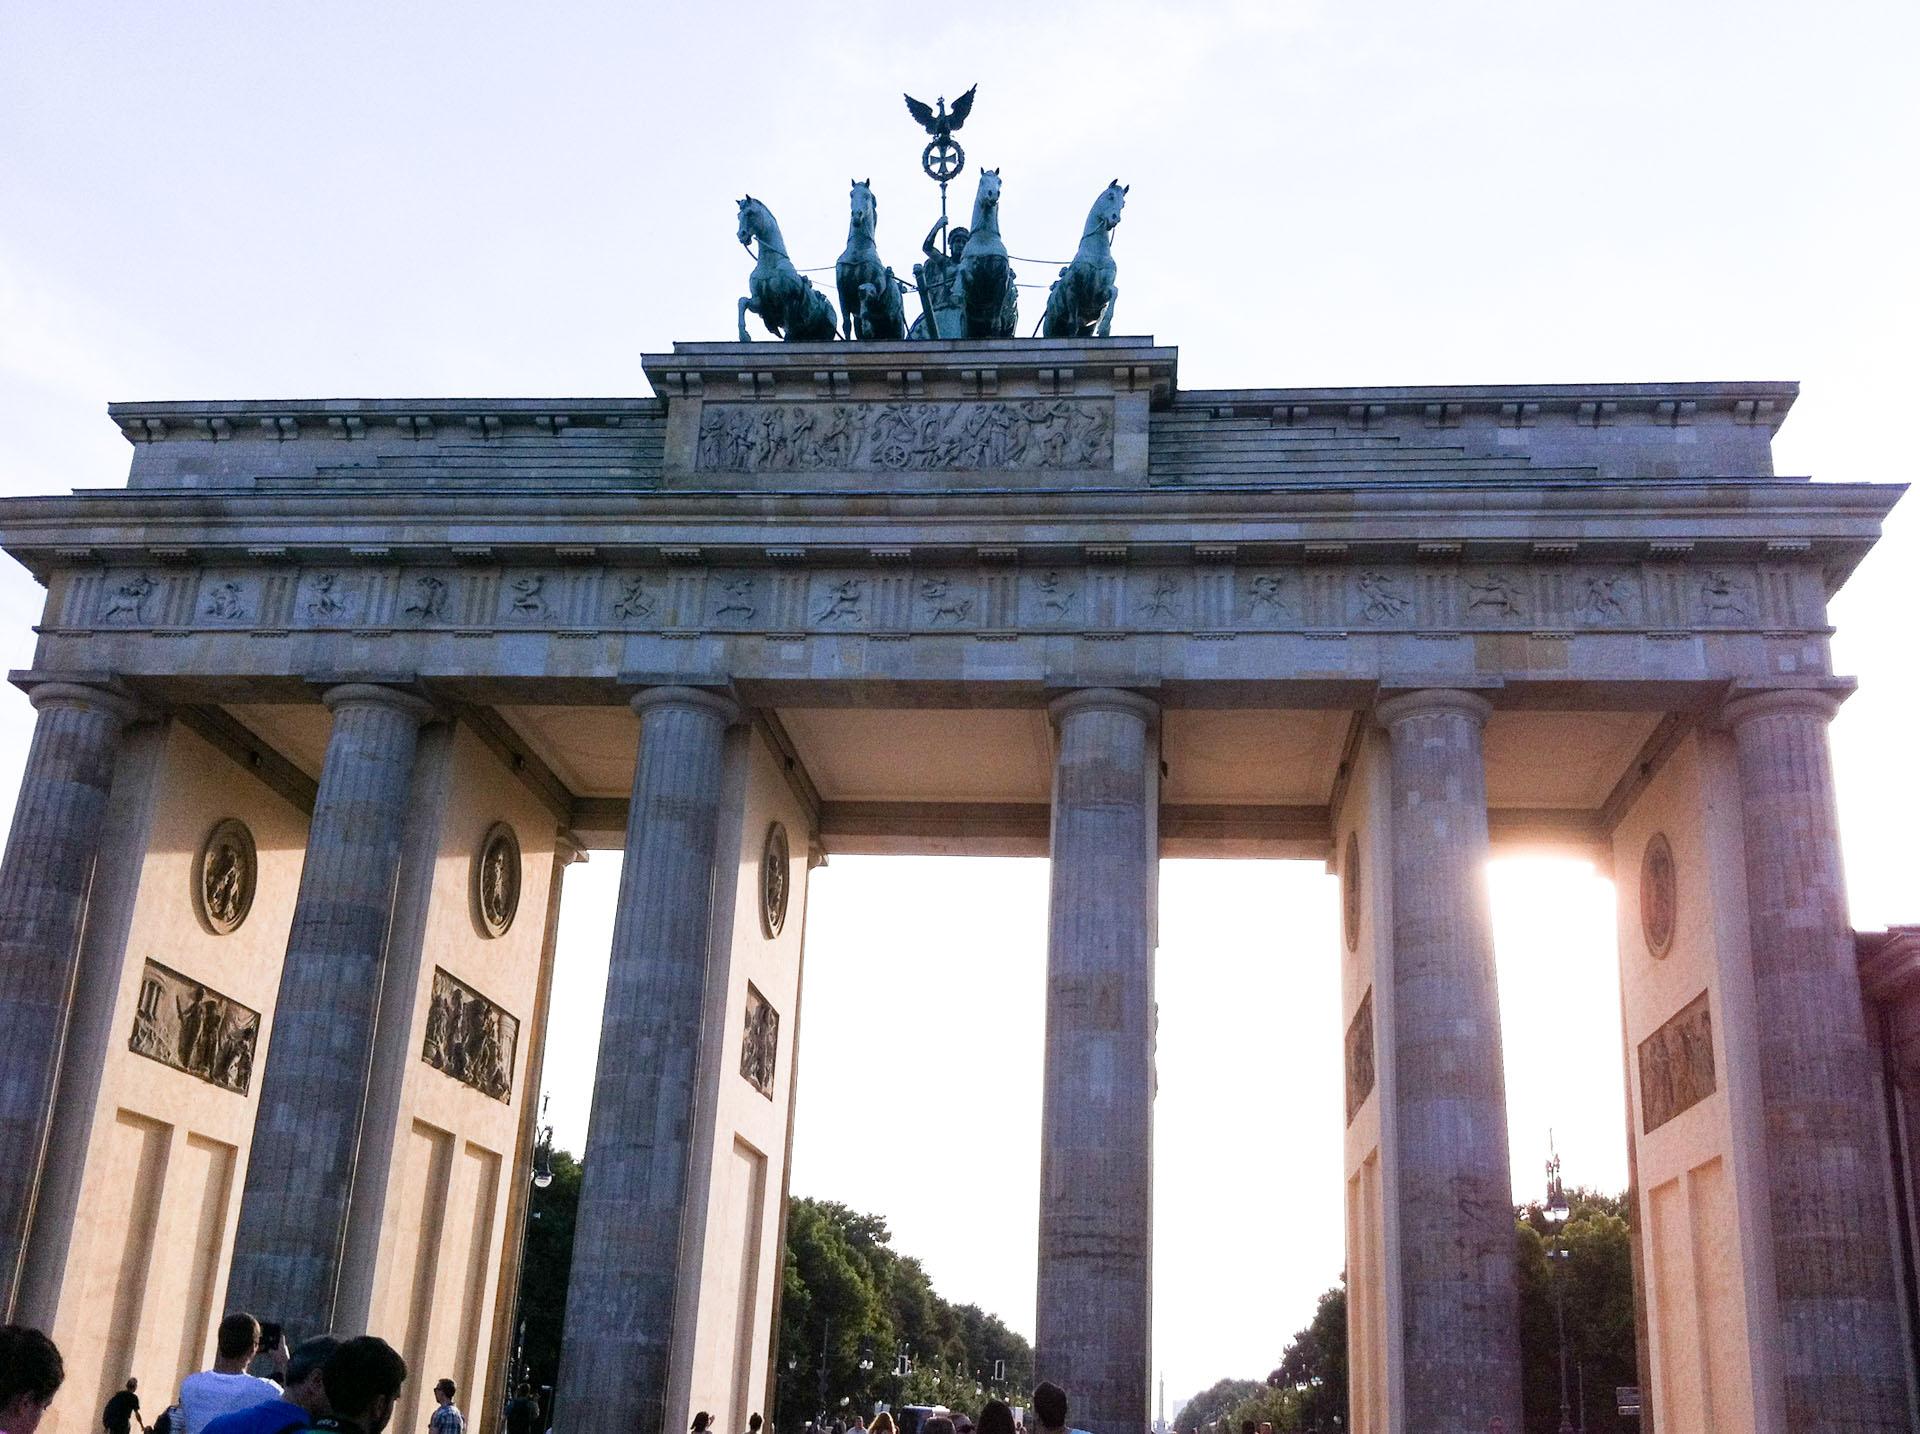 Berlino senza glutine gluten free travel and living - Berlino porta di brandeburgo ...